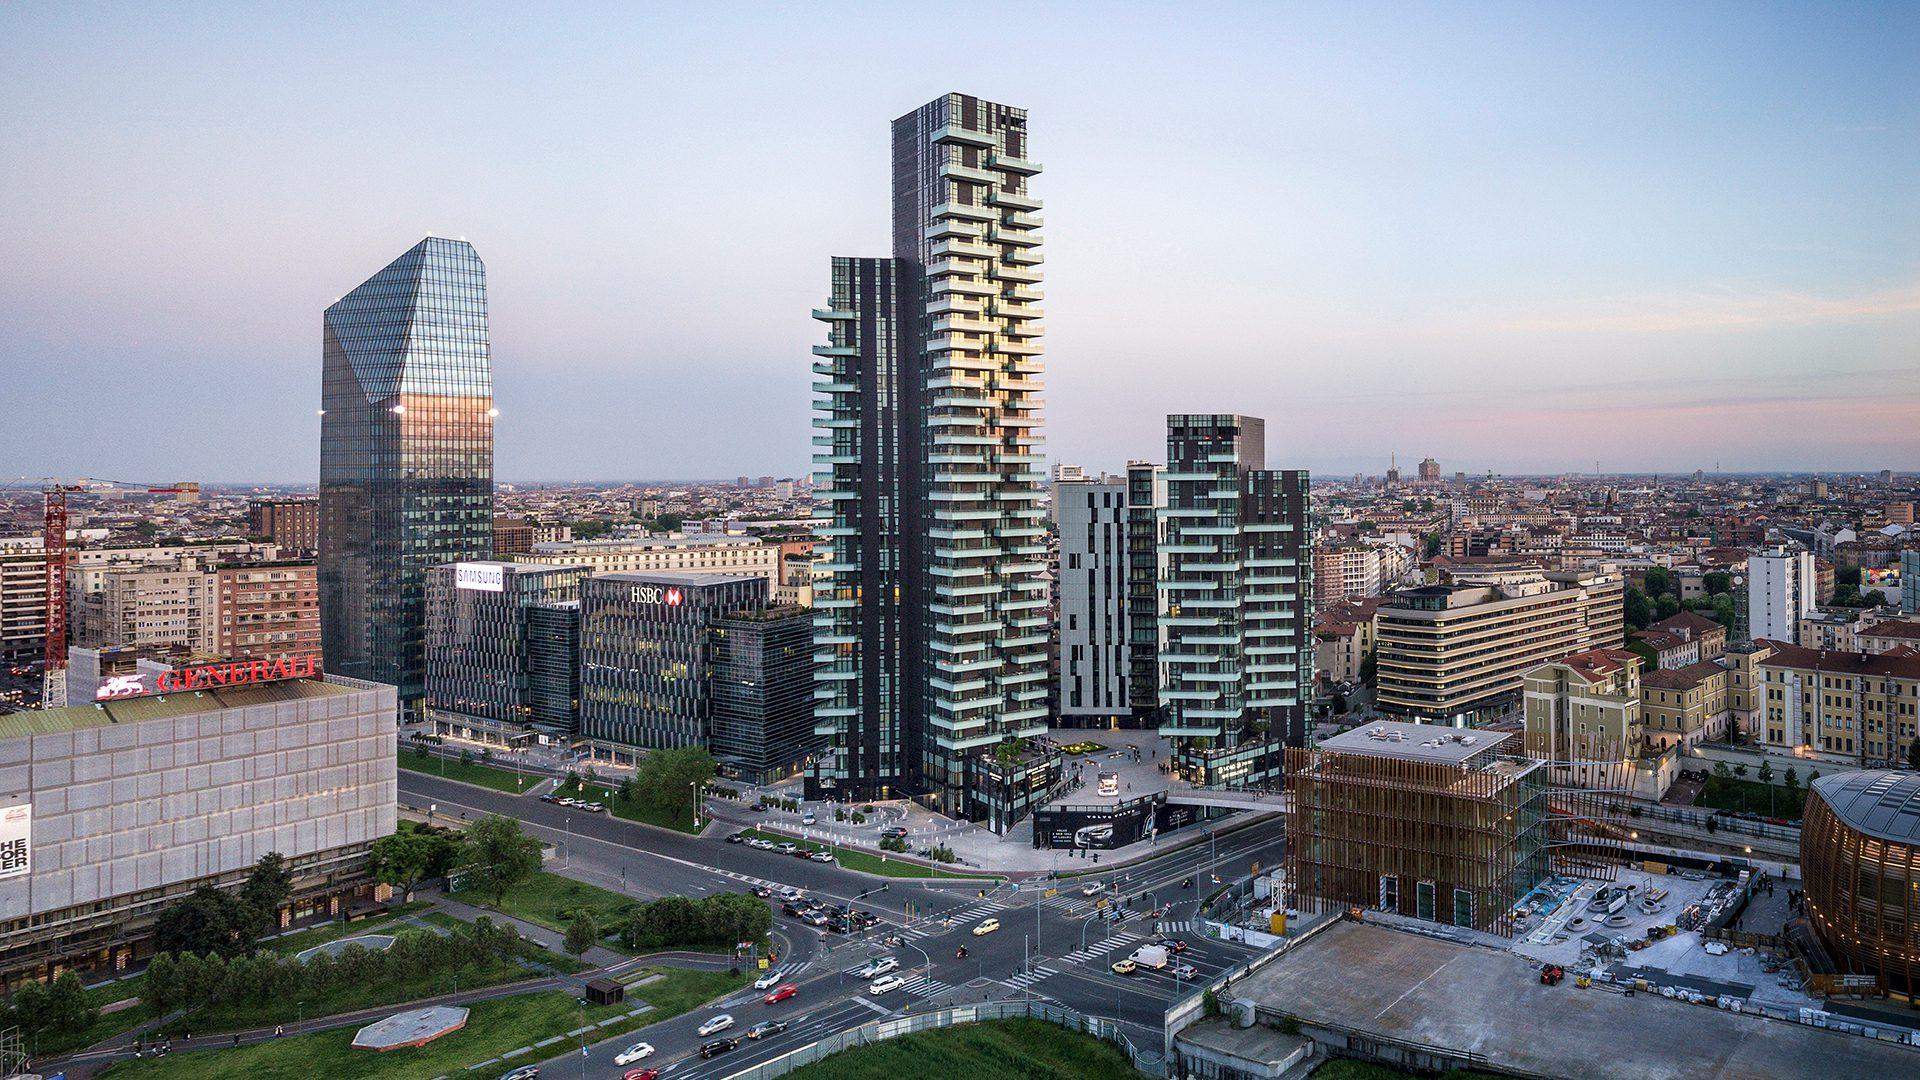 Arquitectonica Architecture Award Winning Global